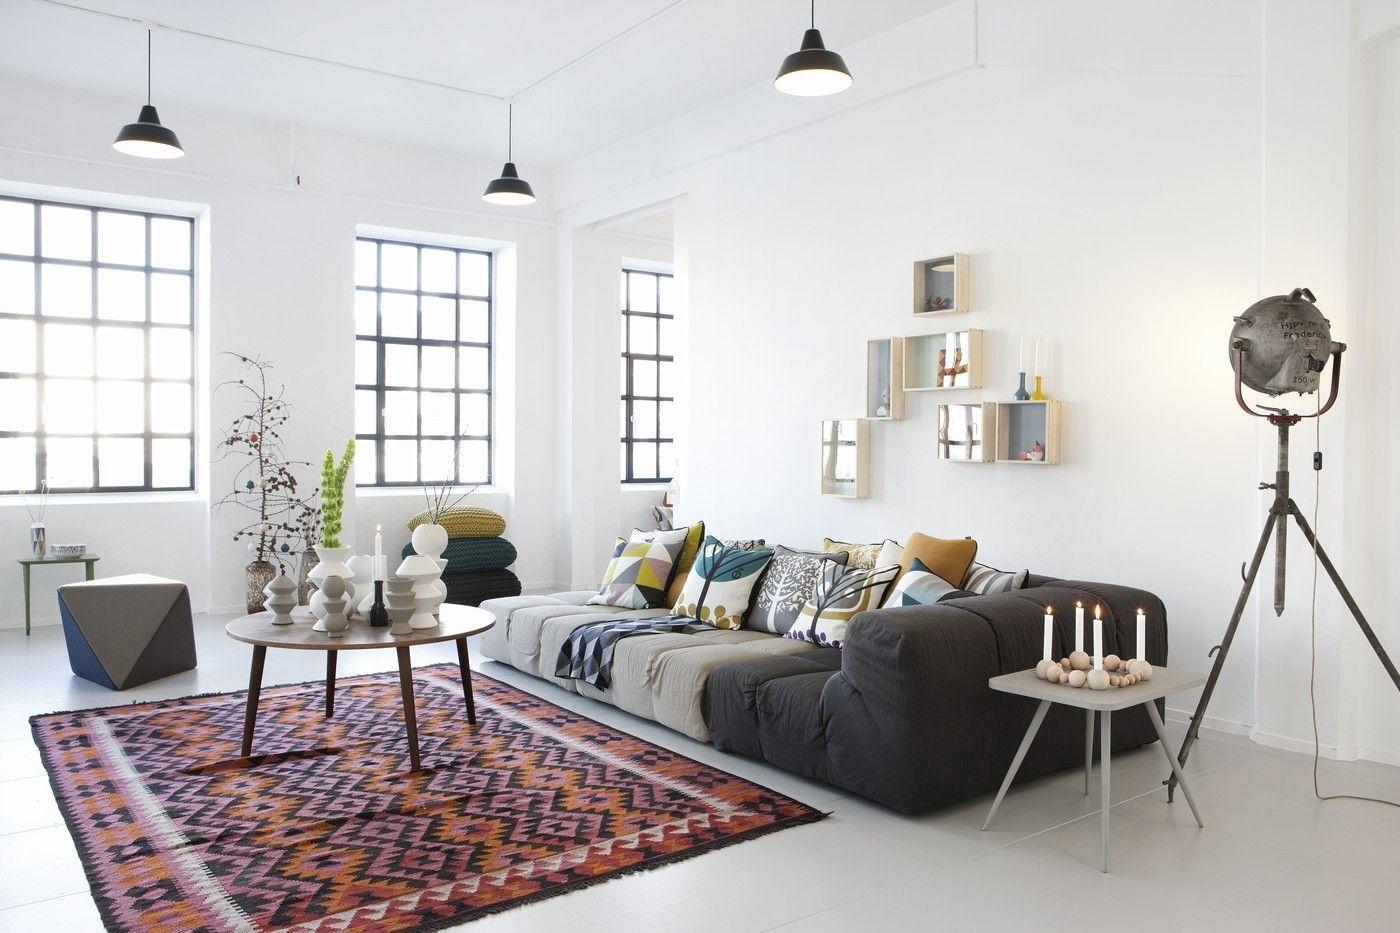 ferm living, déco scandinave & vintage | home sweet home | pinterest